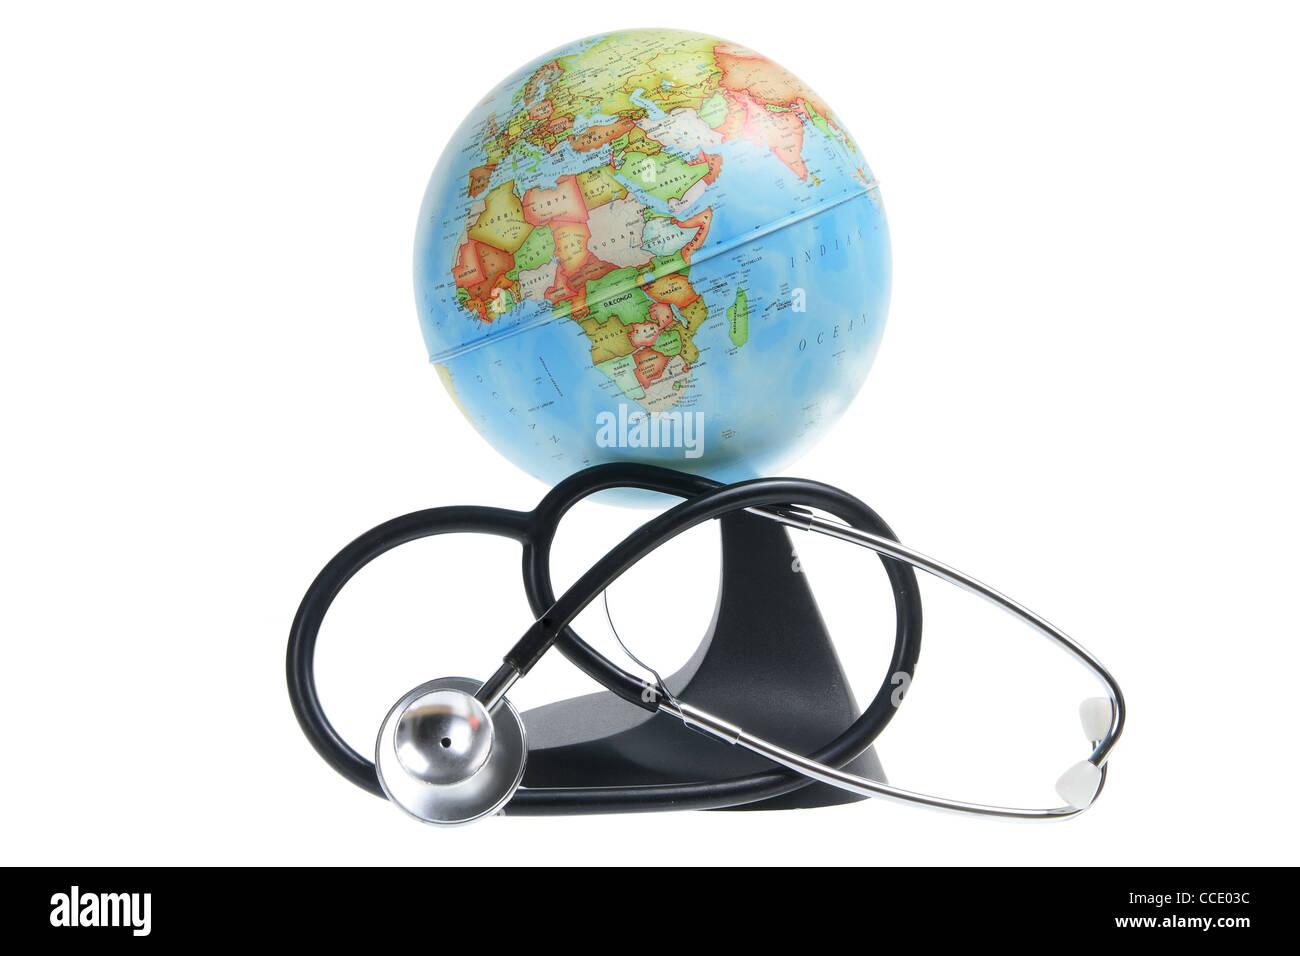 Globus und Stethoskop Stockbild